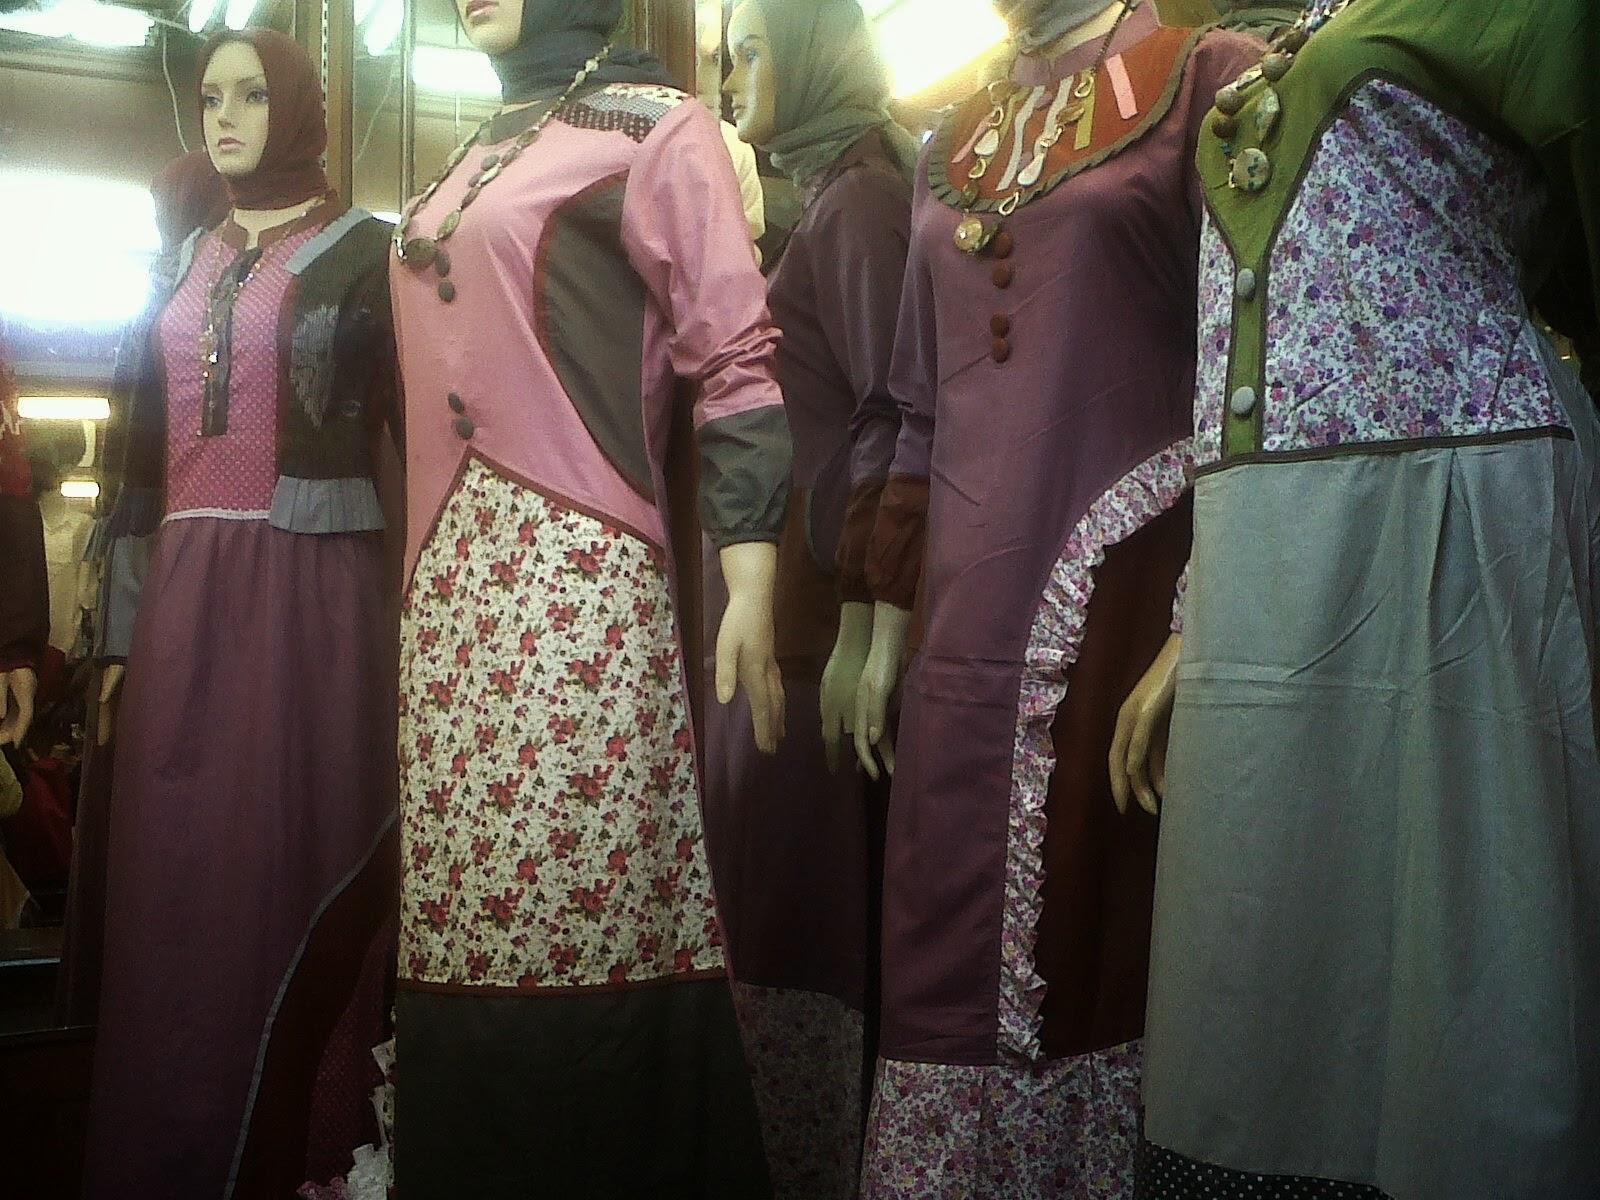 Bisnis Grosir Baju Muslim Murah Surabaya Online | BISNIS ...